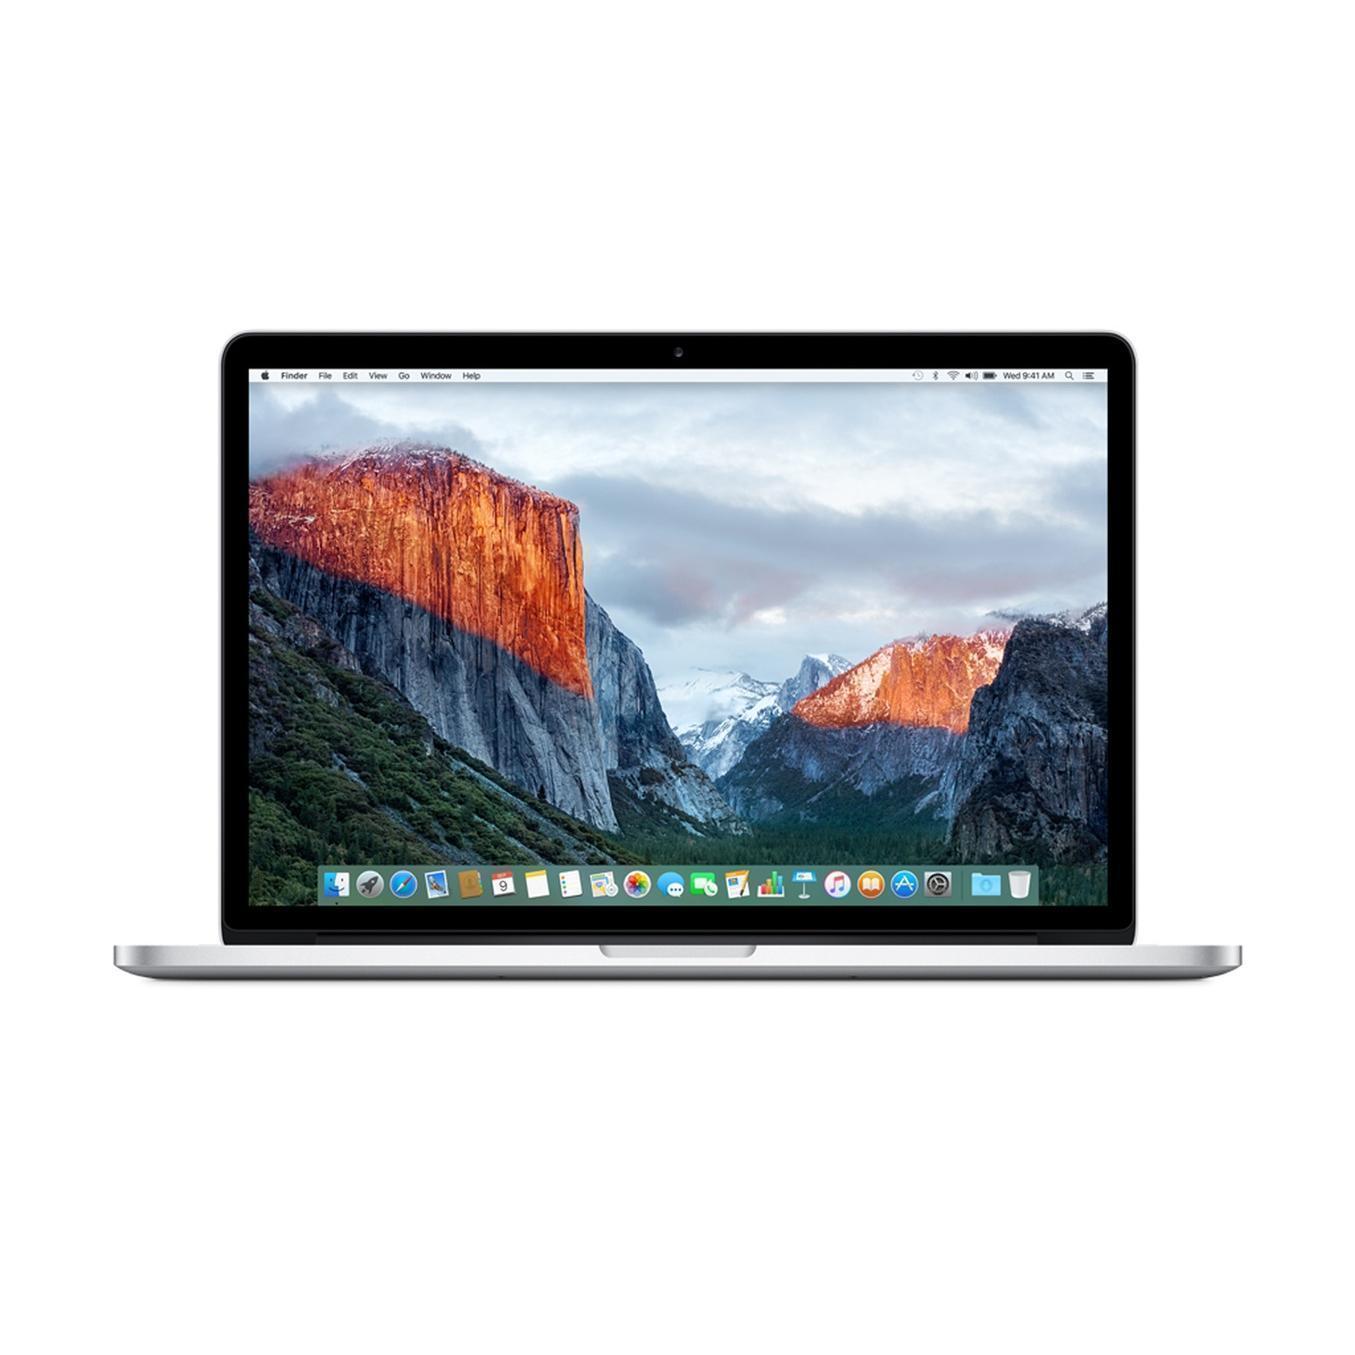 MacBook Pro Retina 15.4-inch (2013) - Core i7 - 16GB - SSD 512 GB QWERTY